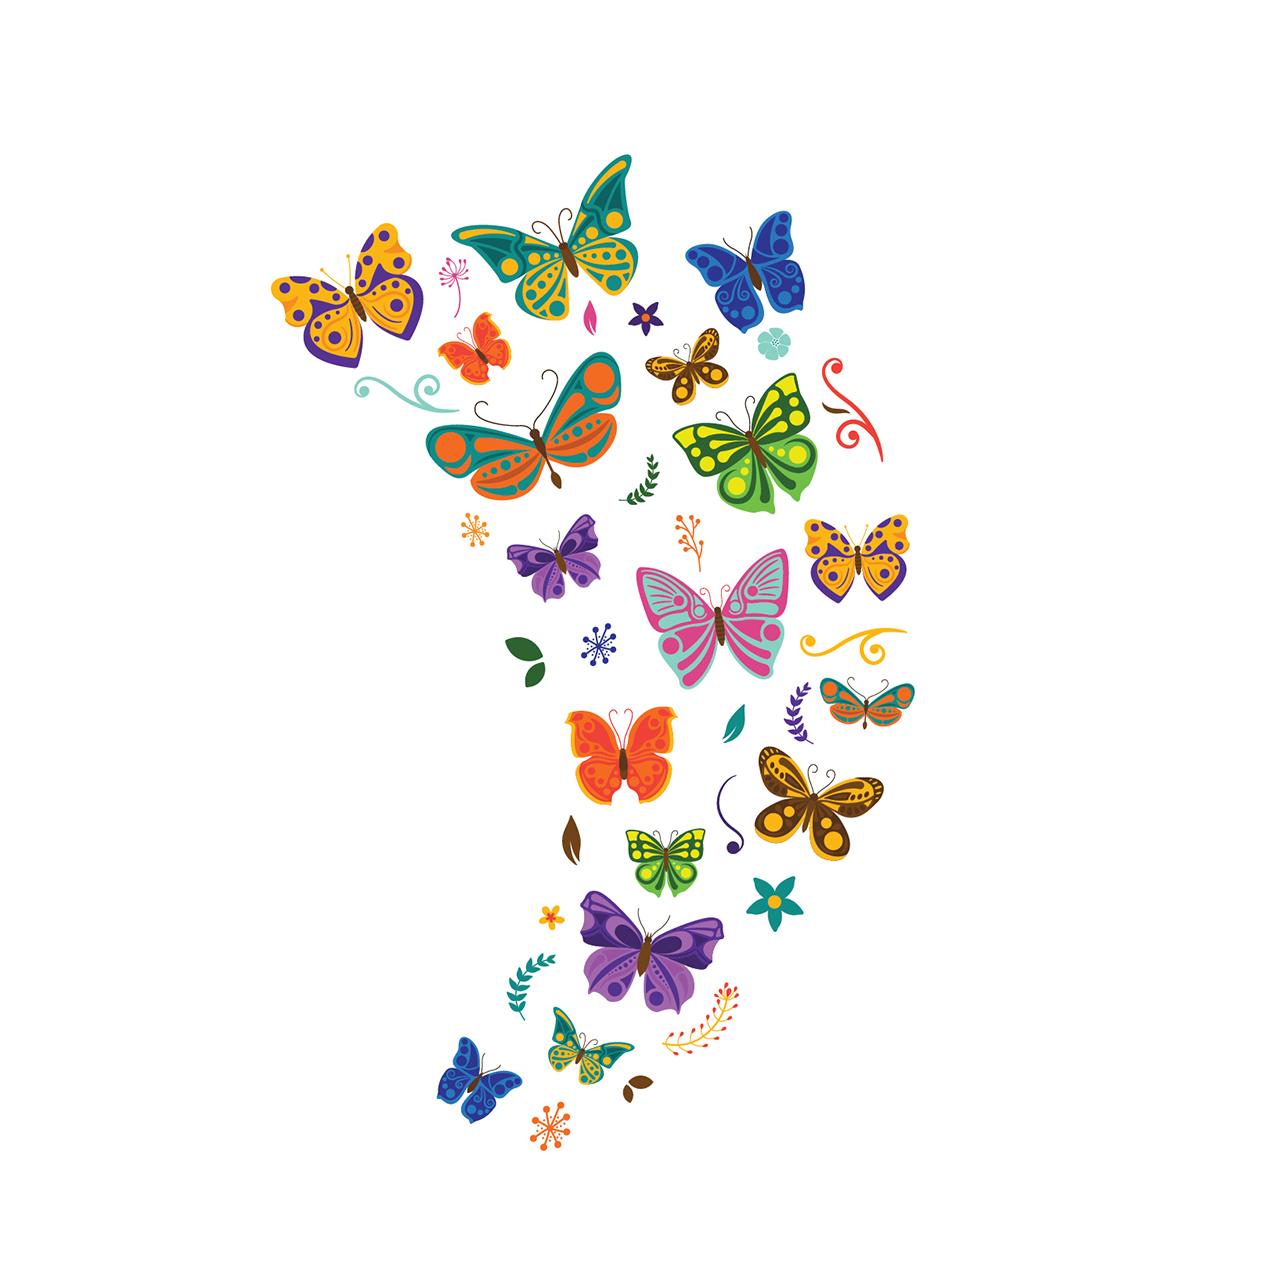 استیکر دیواری سالسو طرح پروانه های رنگارنگ a.z